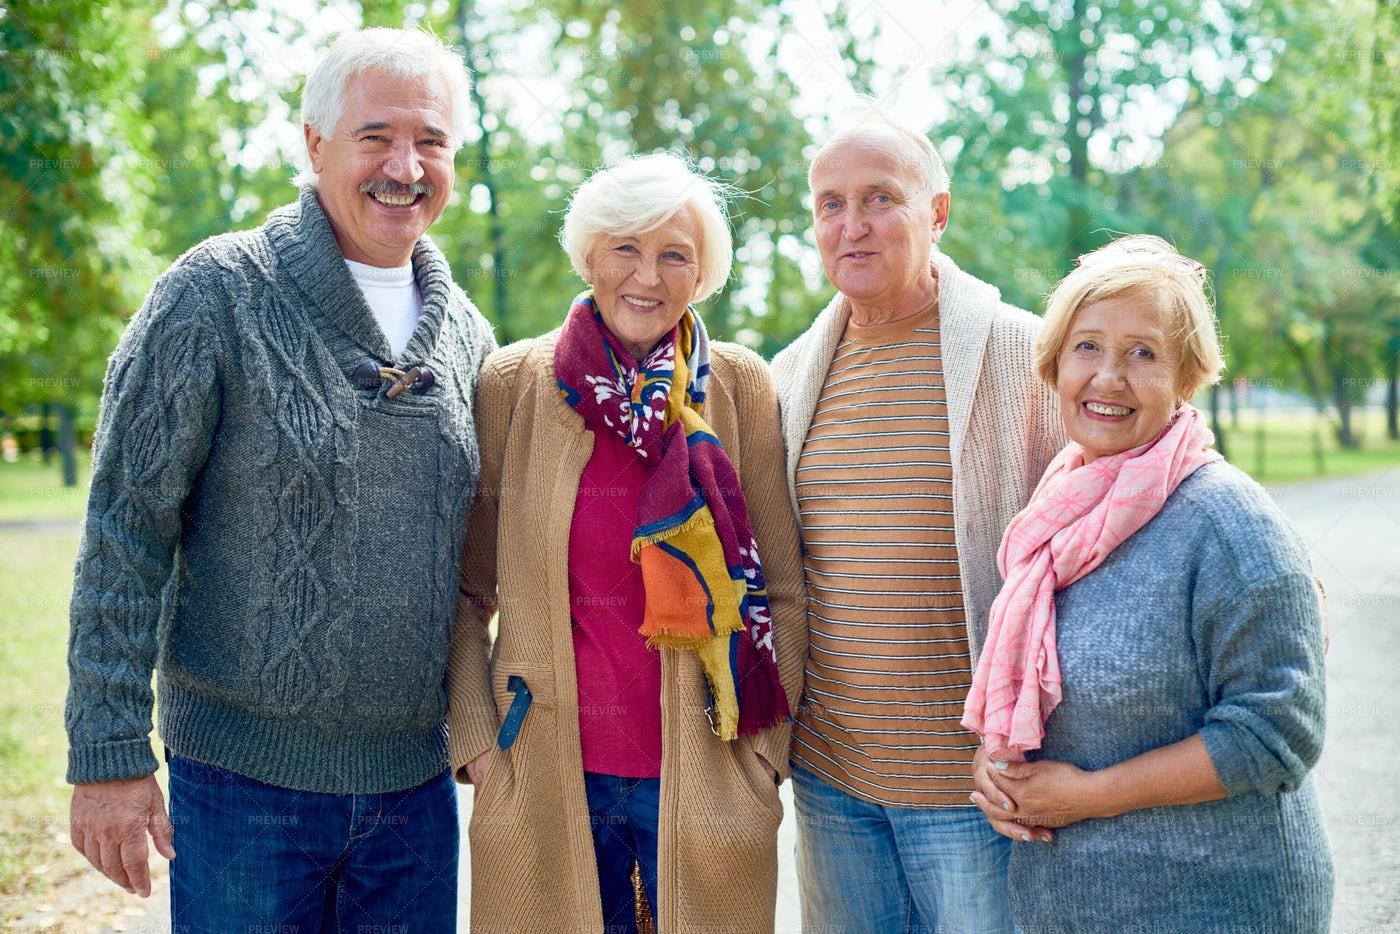 Portrait Of Smiling Senior Friends: Stock Photos